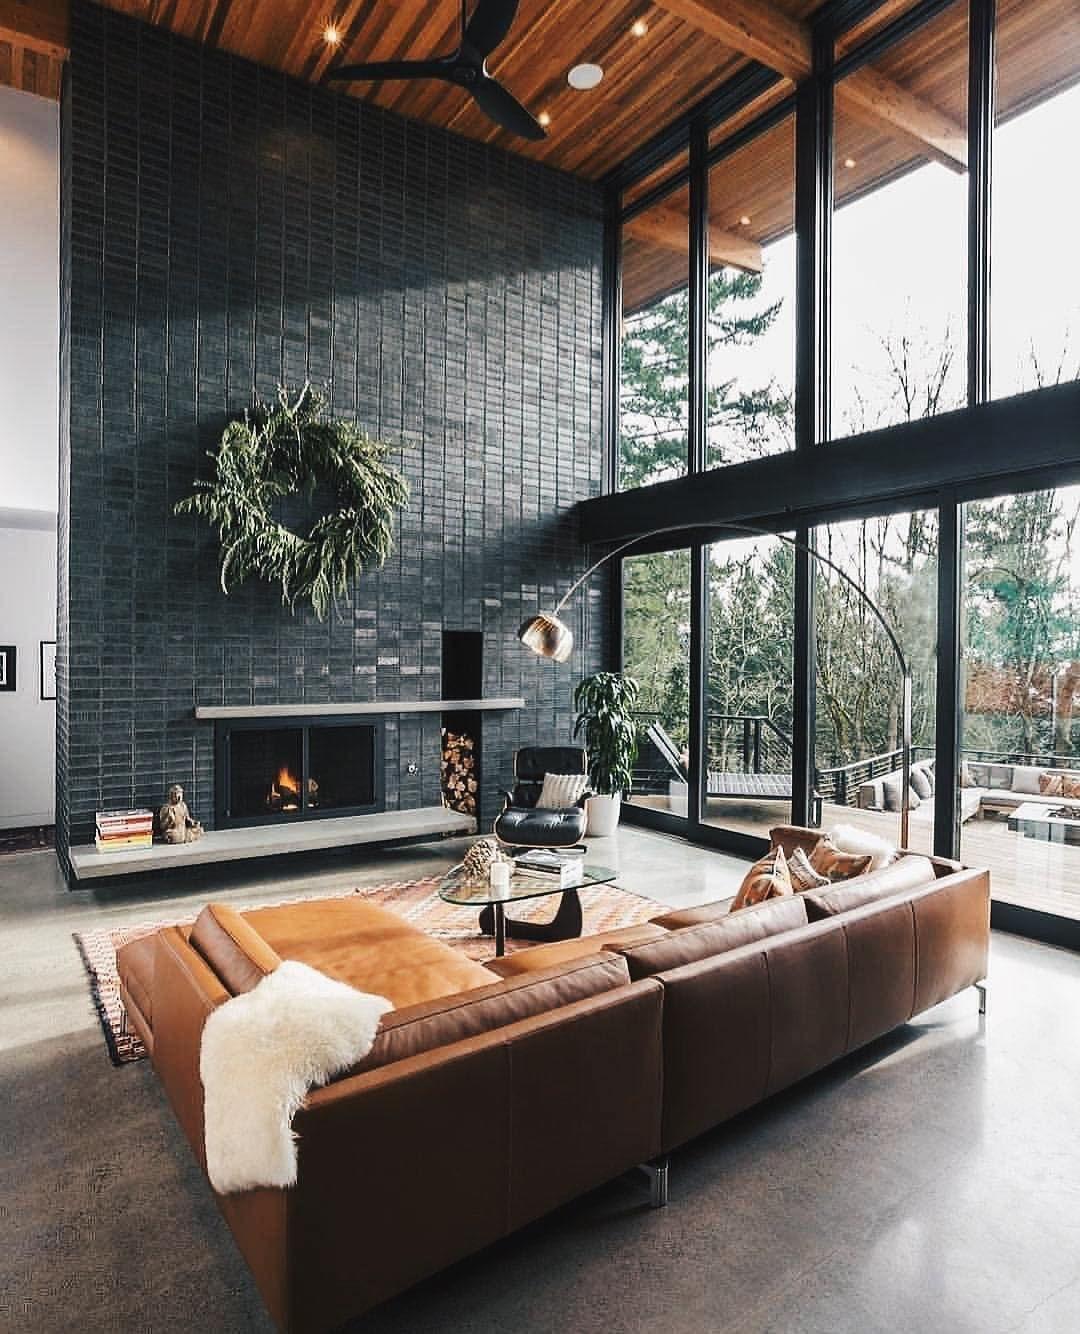 Loft Interior Design Ideas On Instagram ЧТО ВЫ БЫ УБРАЛИ В ЭТОМ ДИЗАЙНЕ Maison Moderne Interieur Interieur Maison Design Maison Design